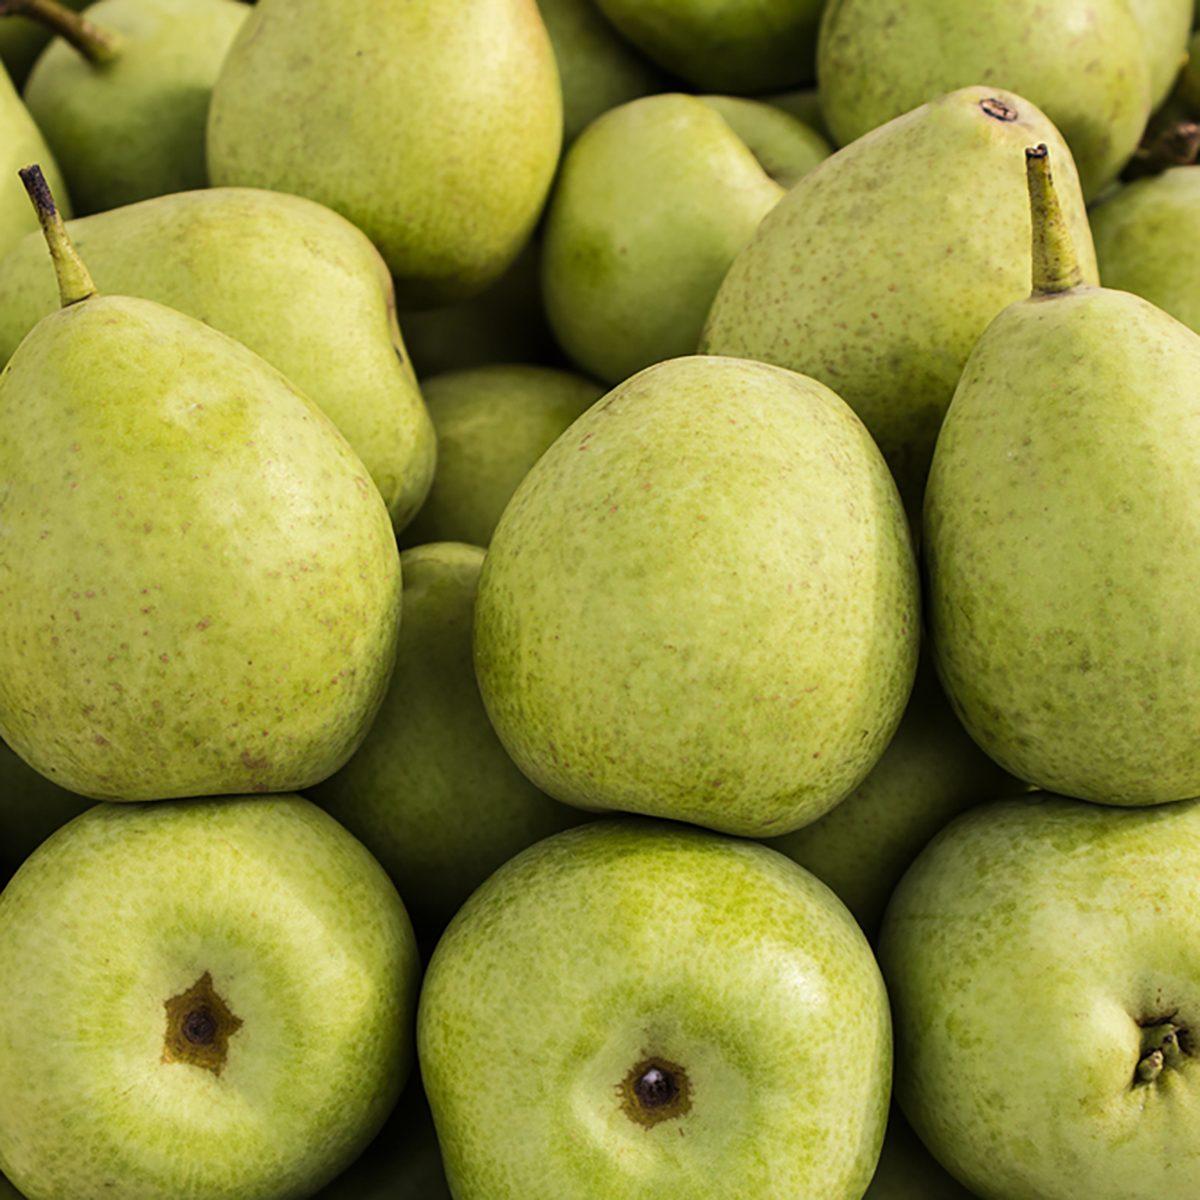 Beautiful Pear Yummy Juicy Fruit